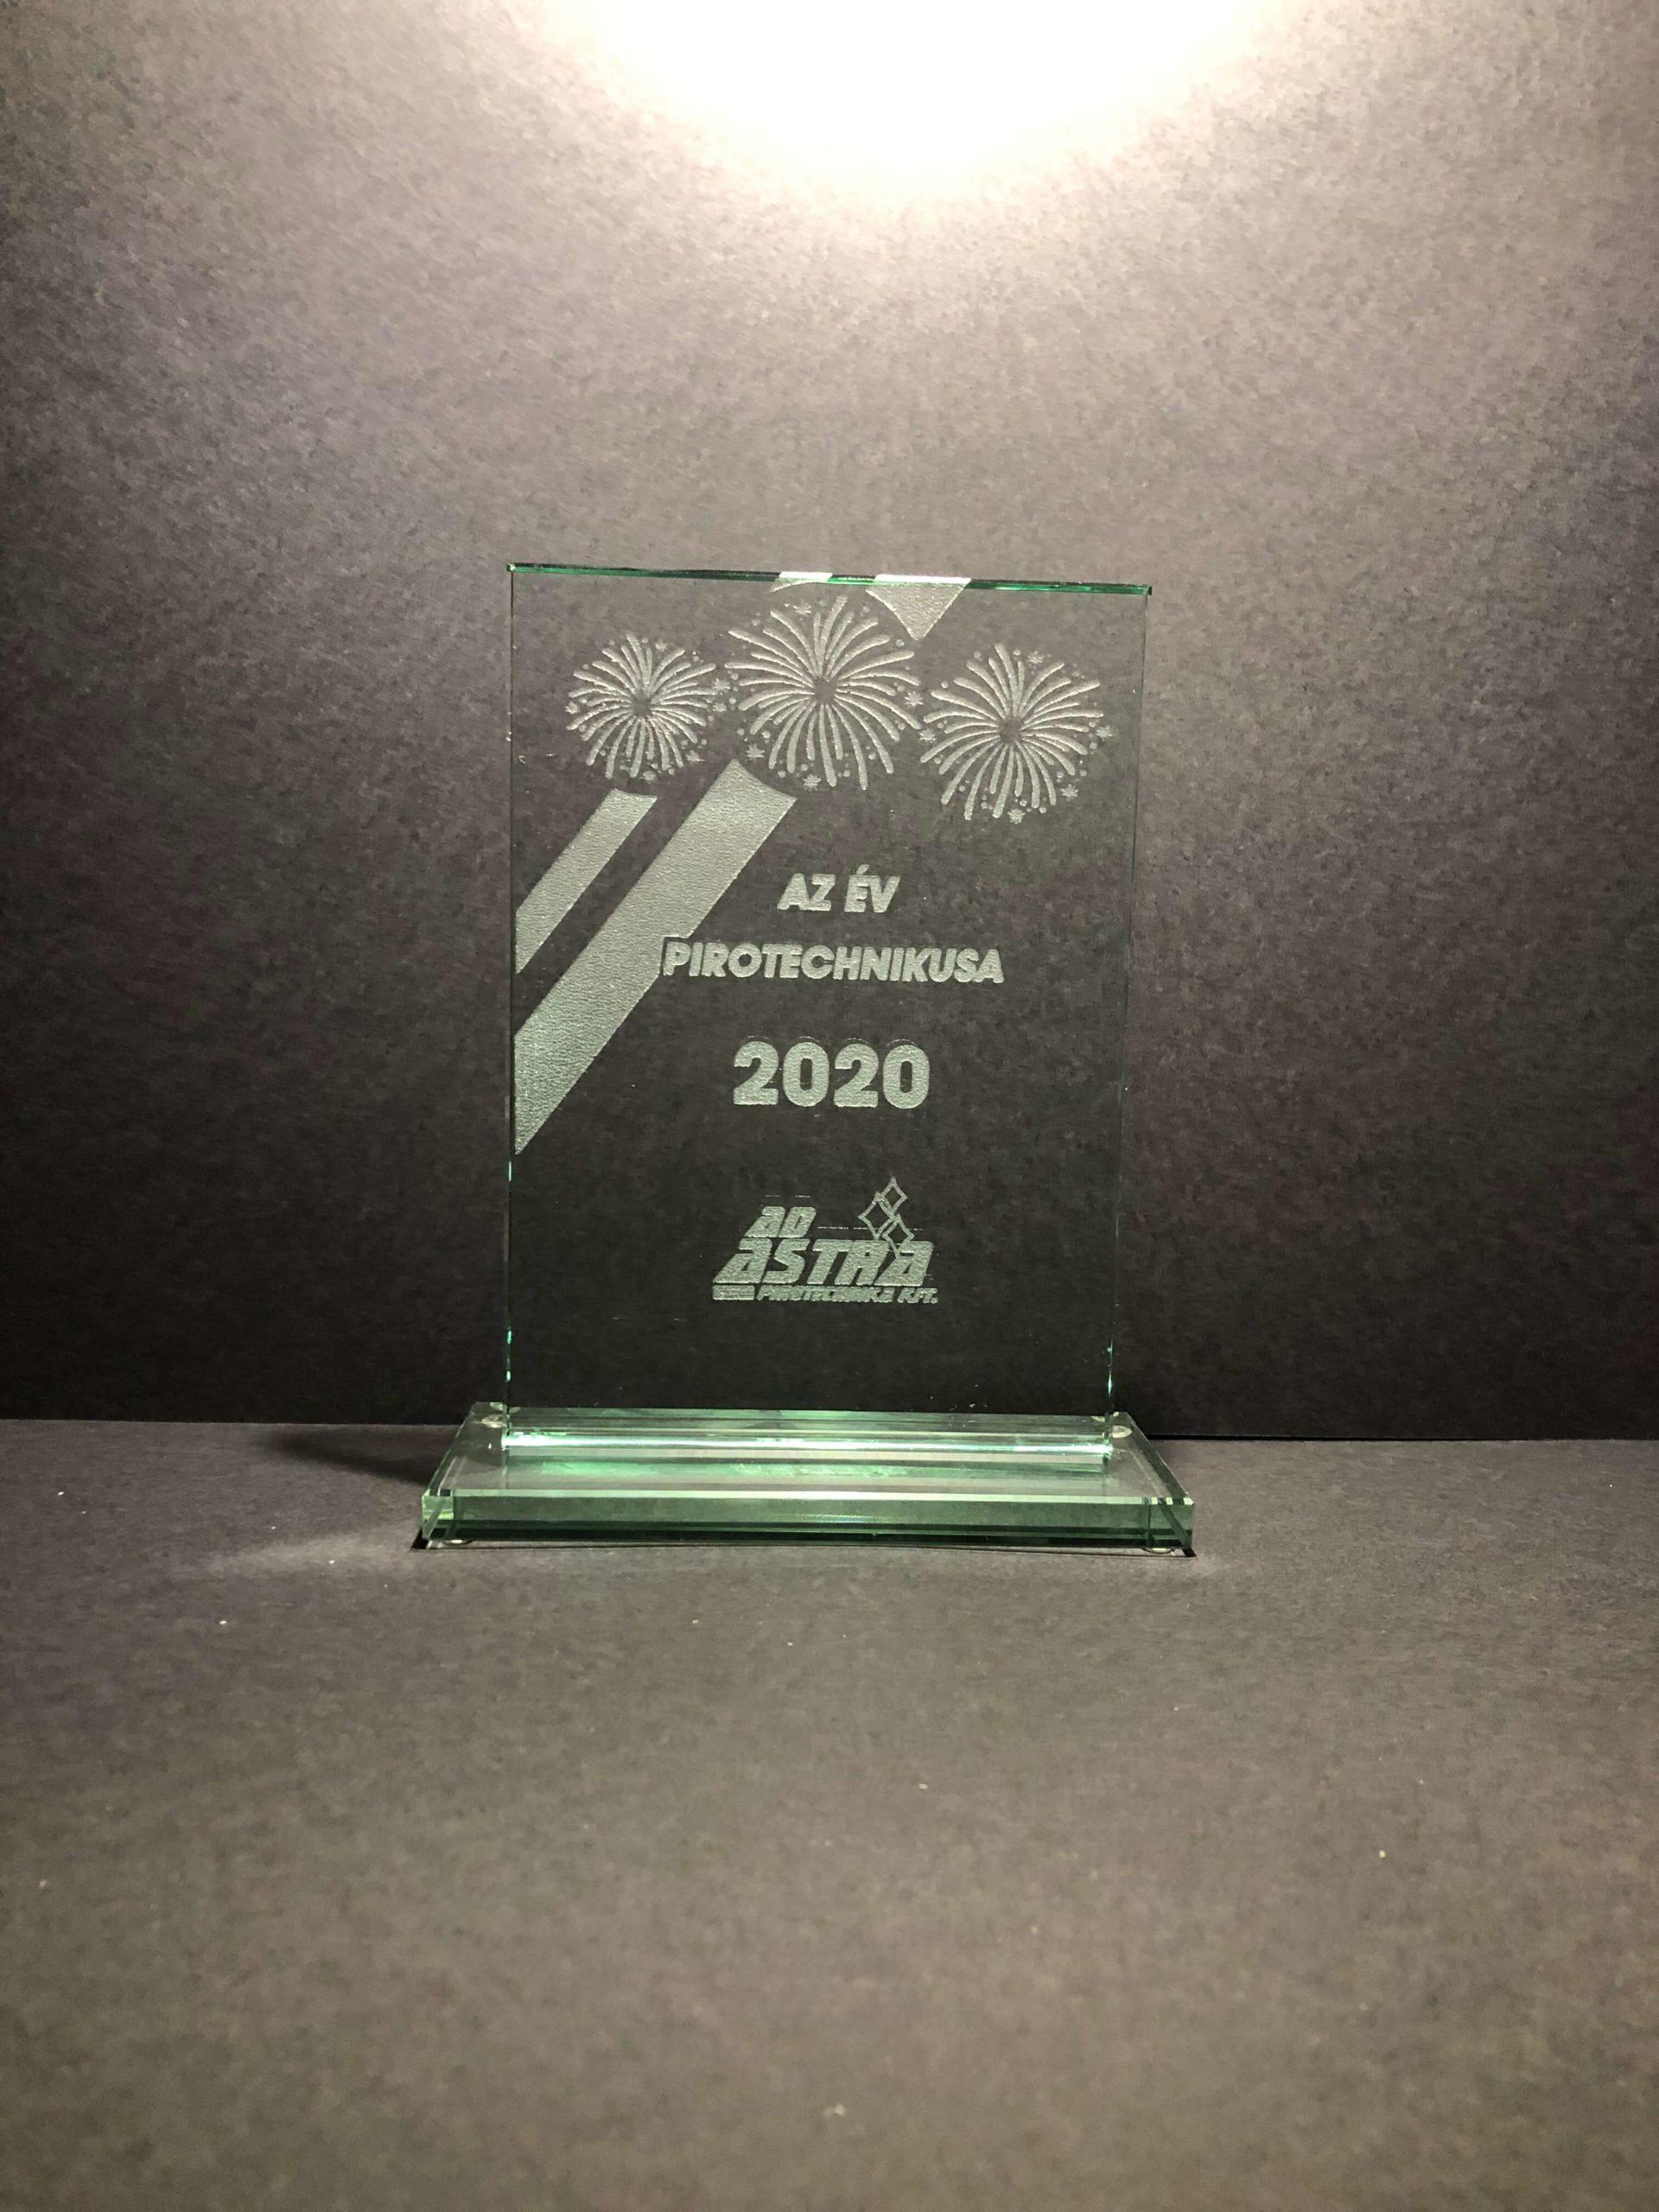 Üveg díj Ad Astra Pirotechnika